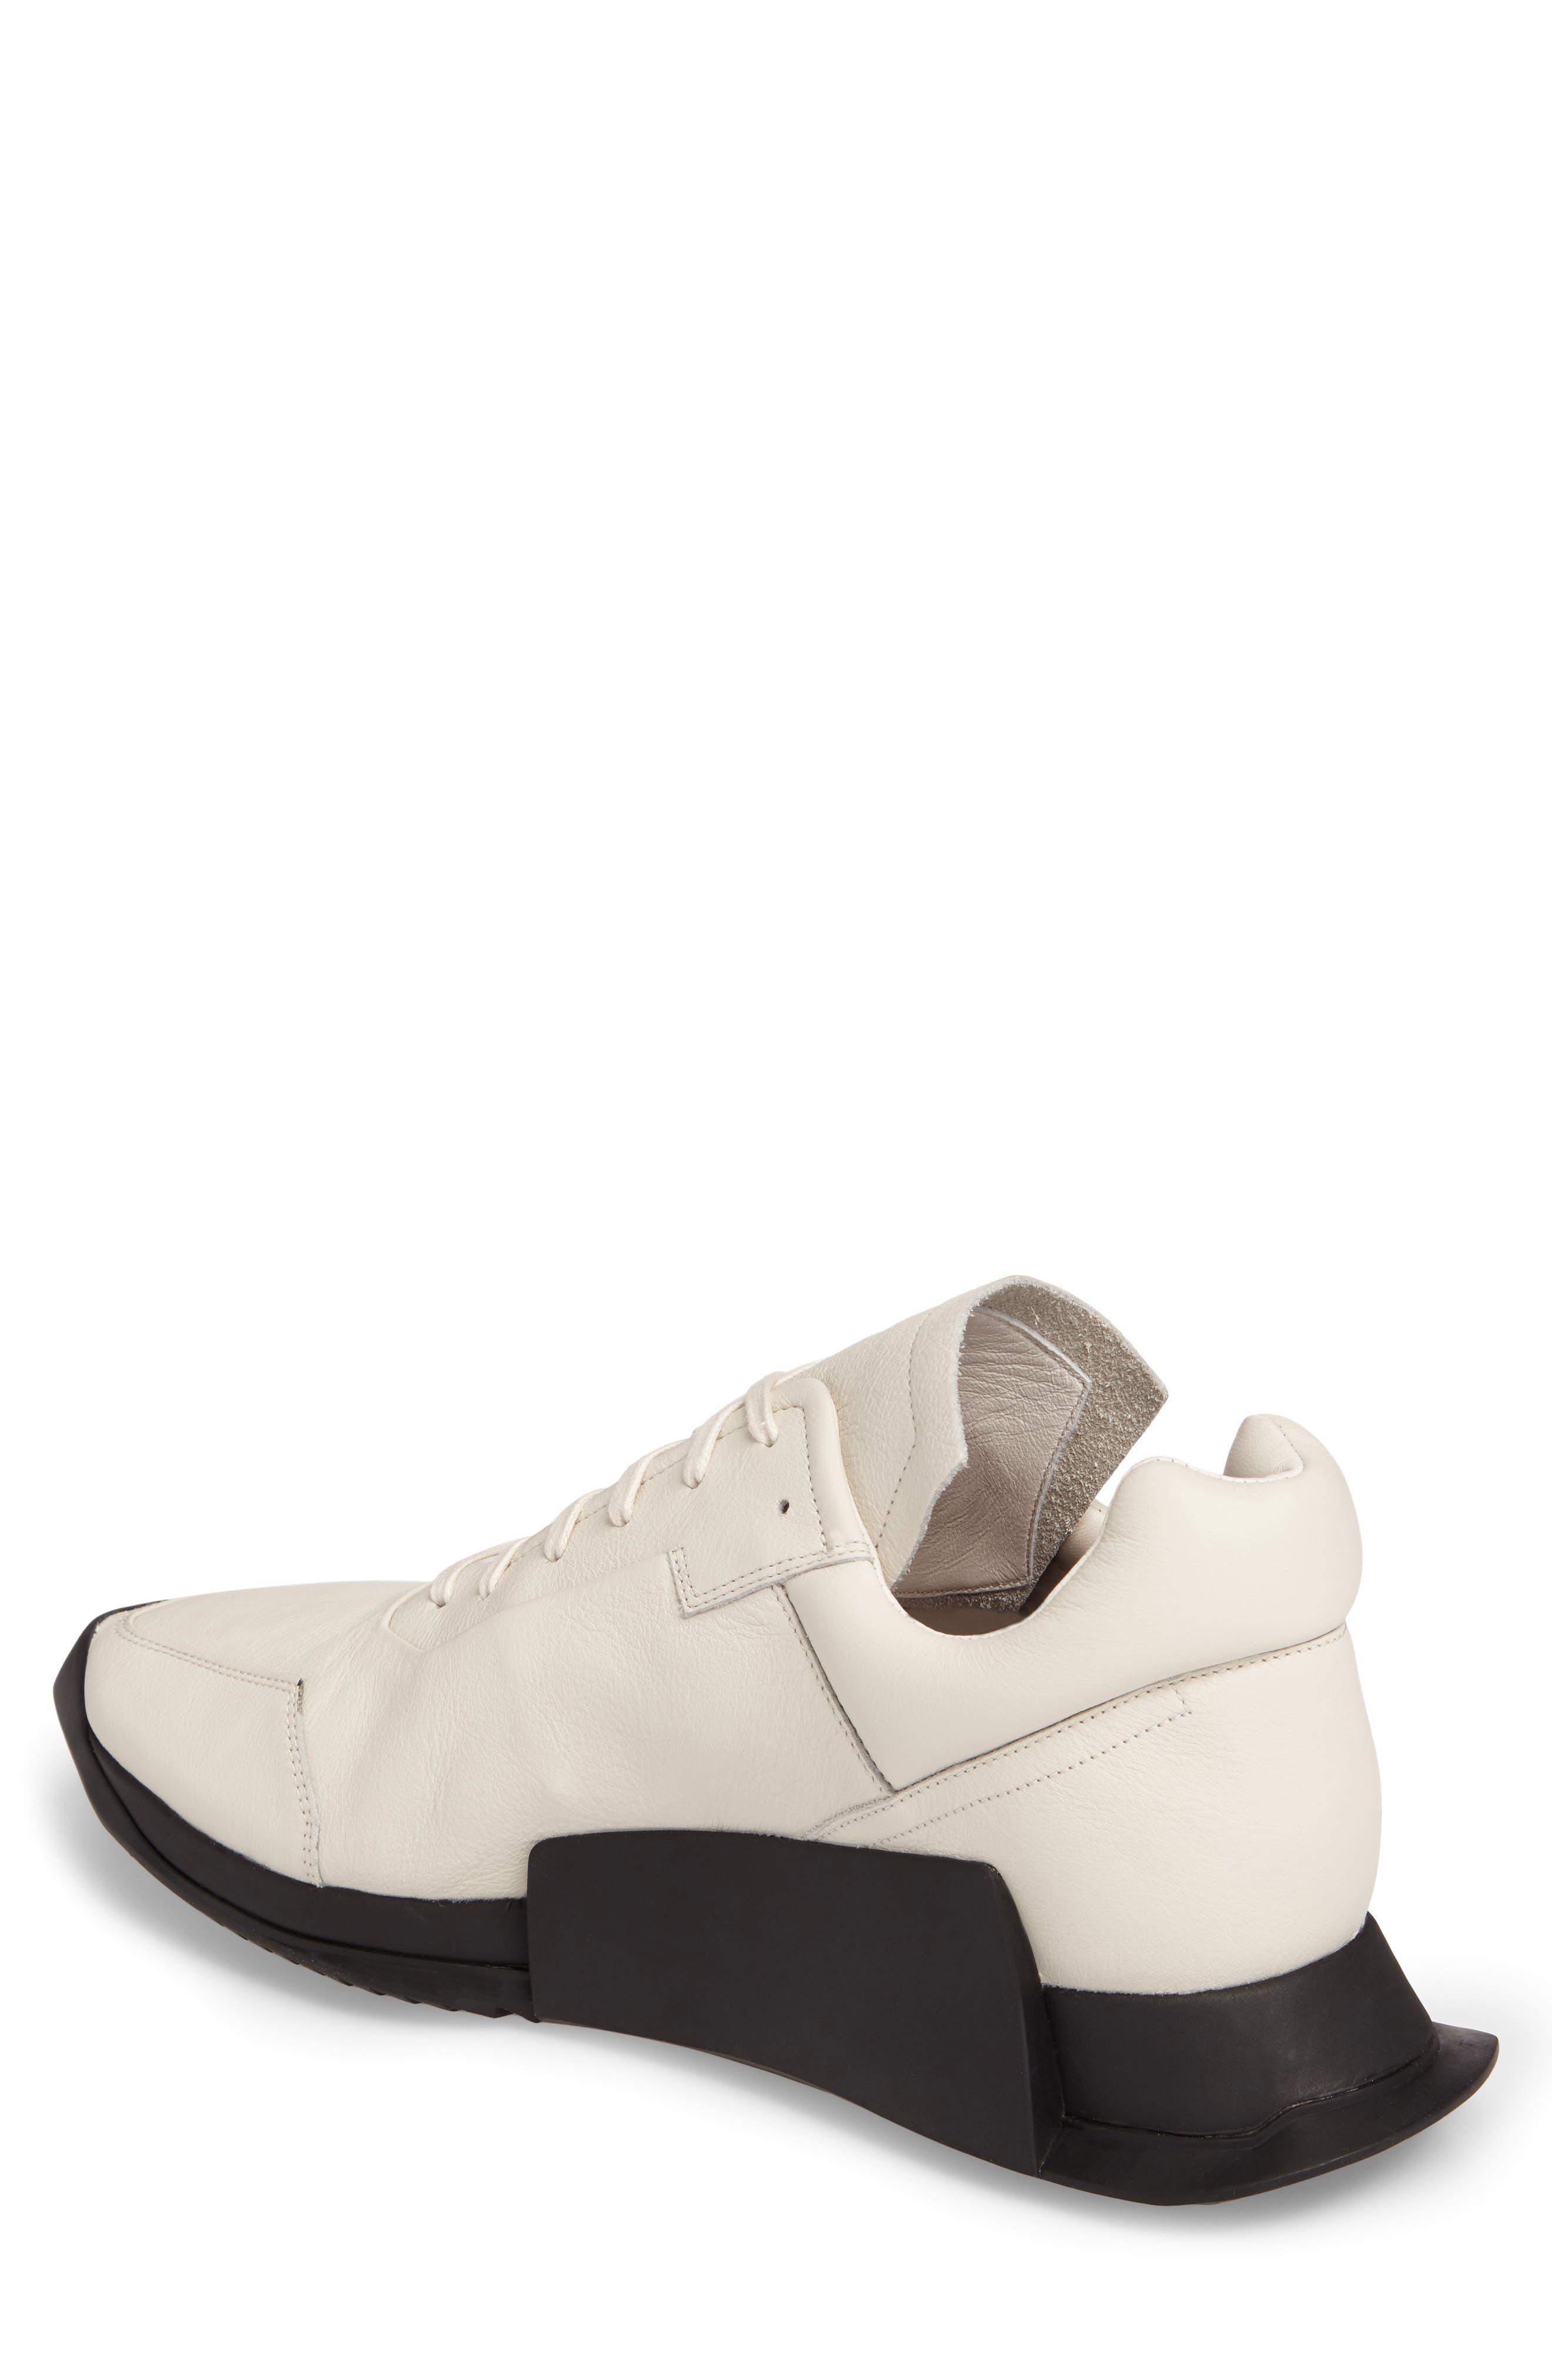 bf9126919b841 Adidas